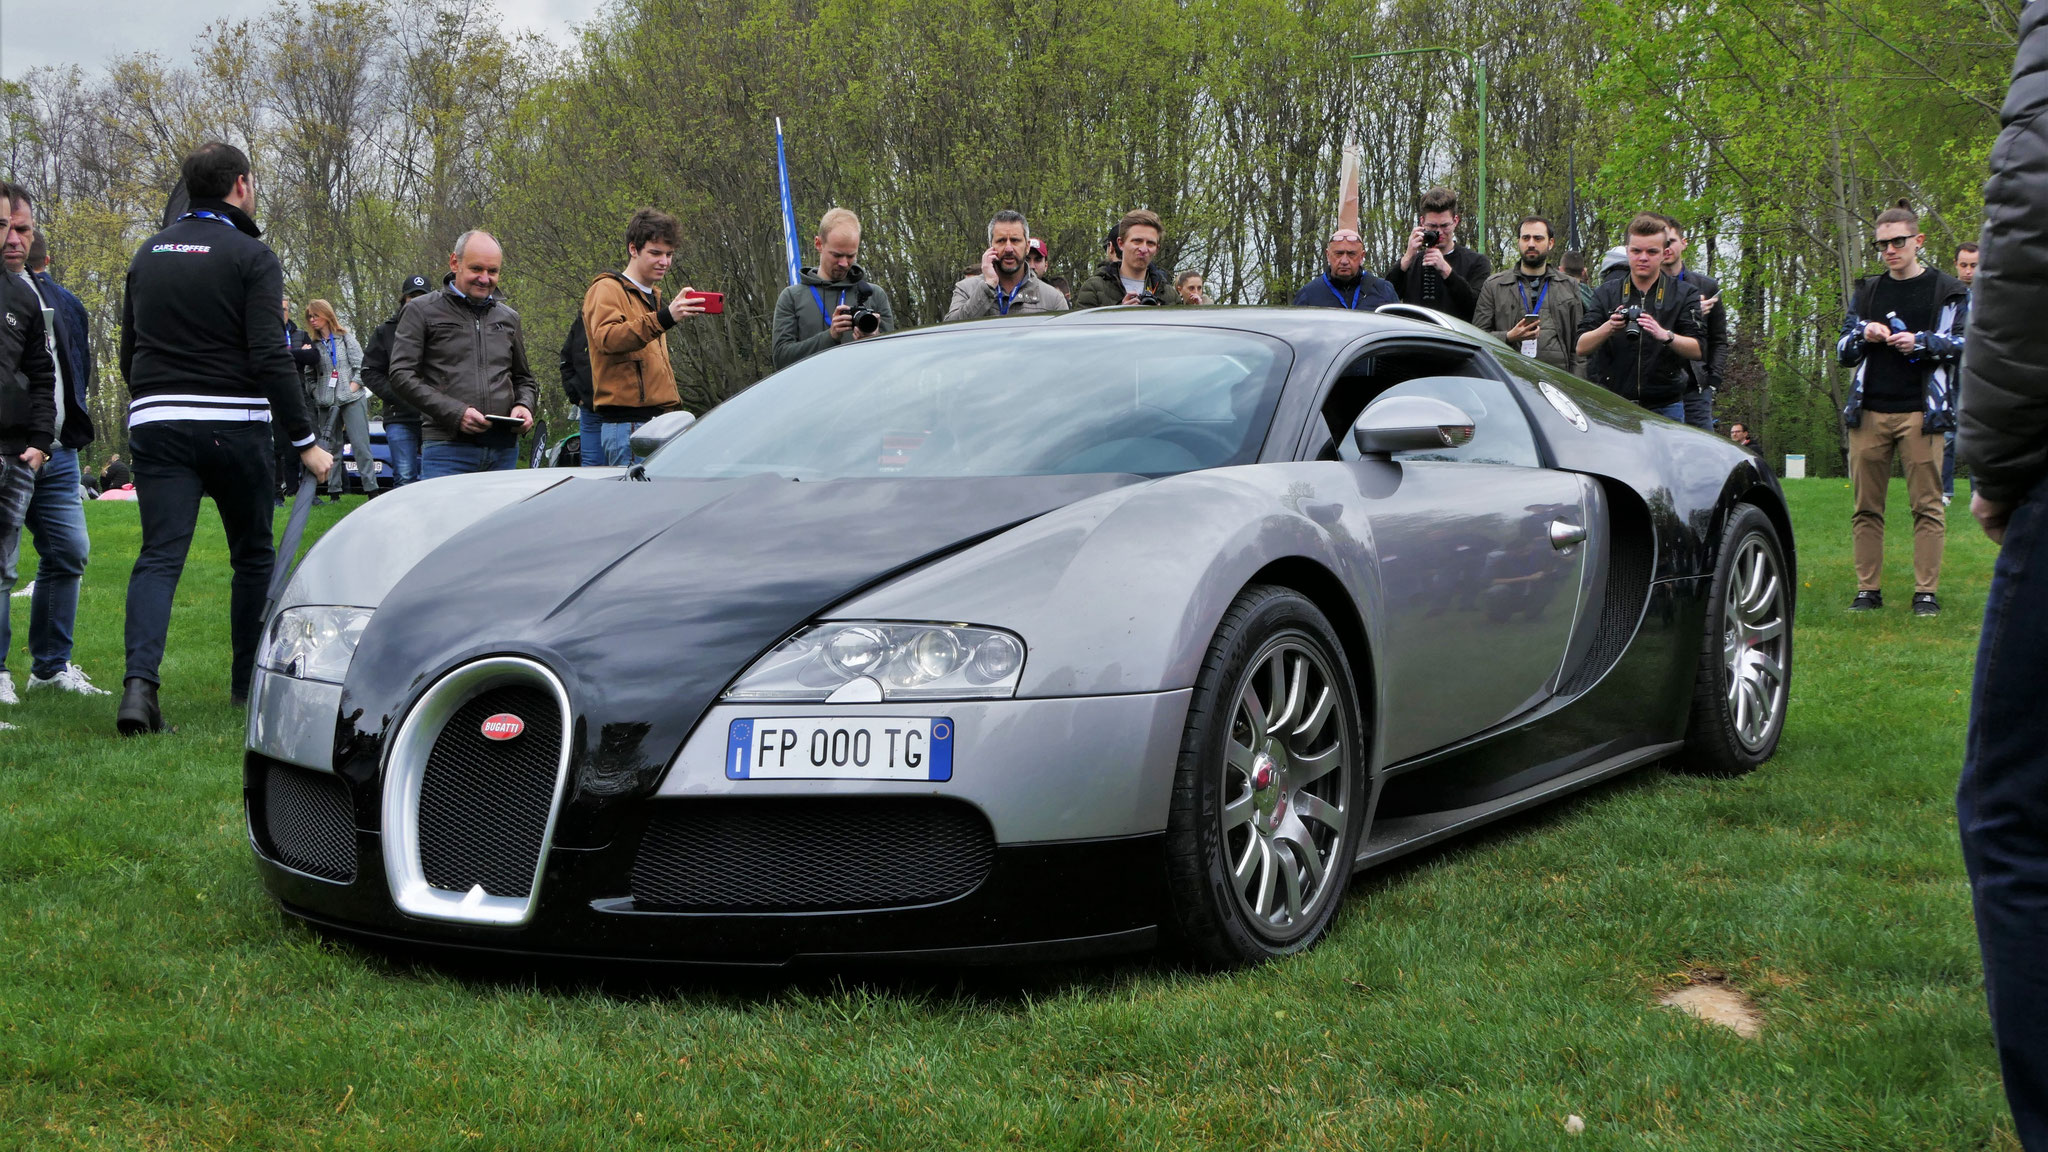 Bugatti Veyron 16.4 - FP-000-TG (ITA)